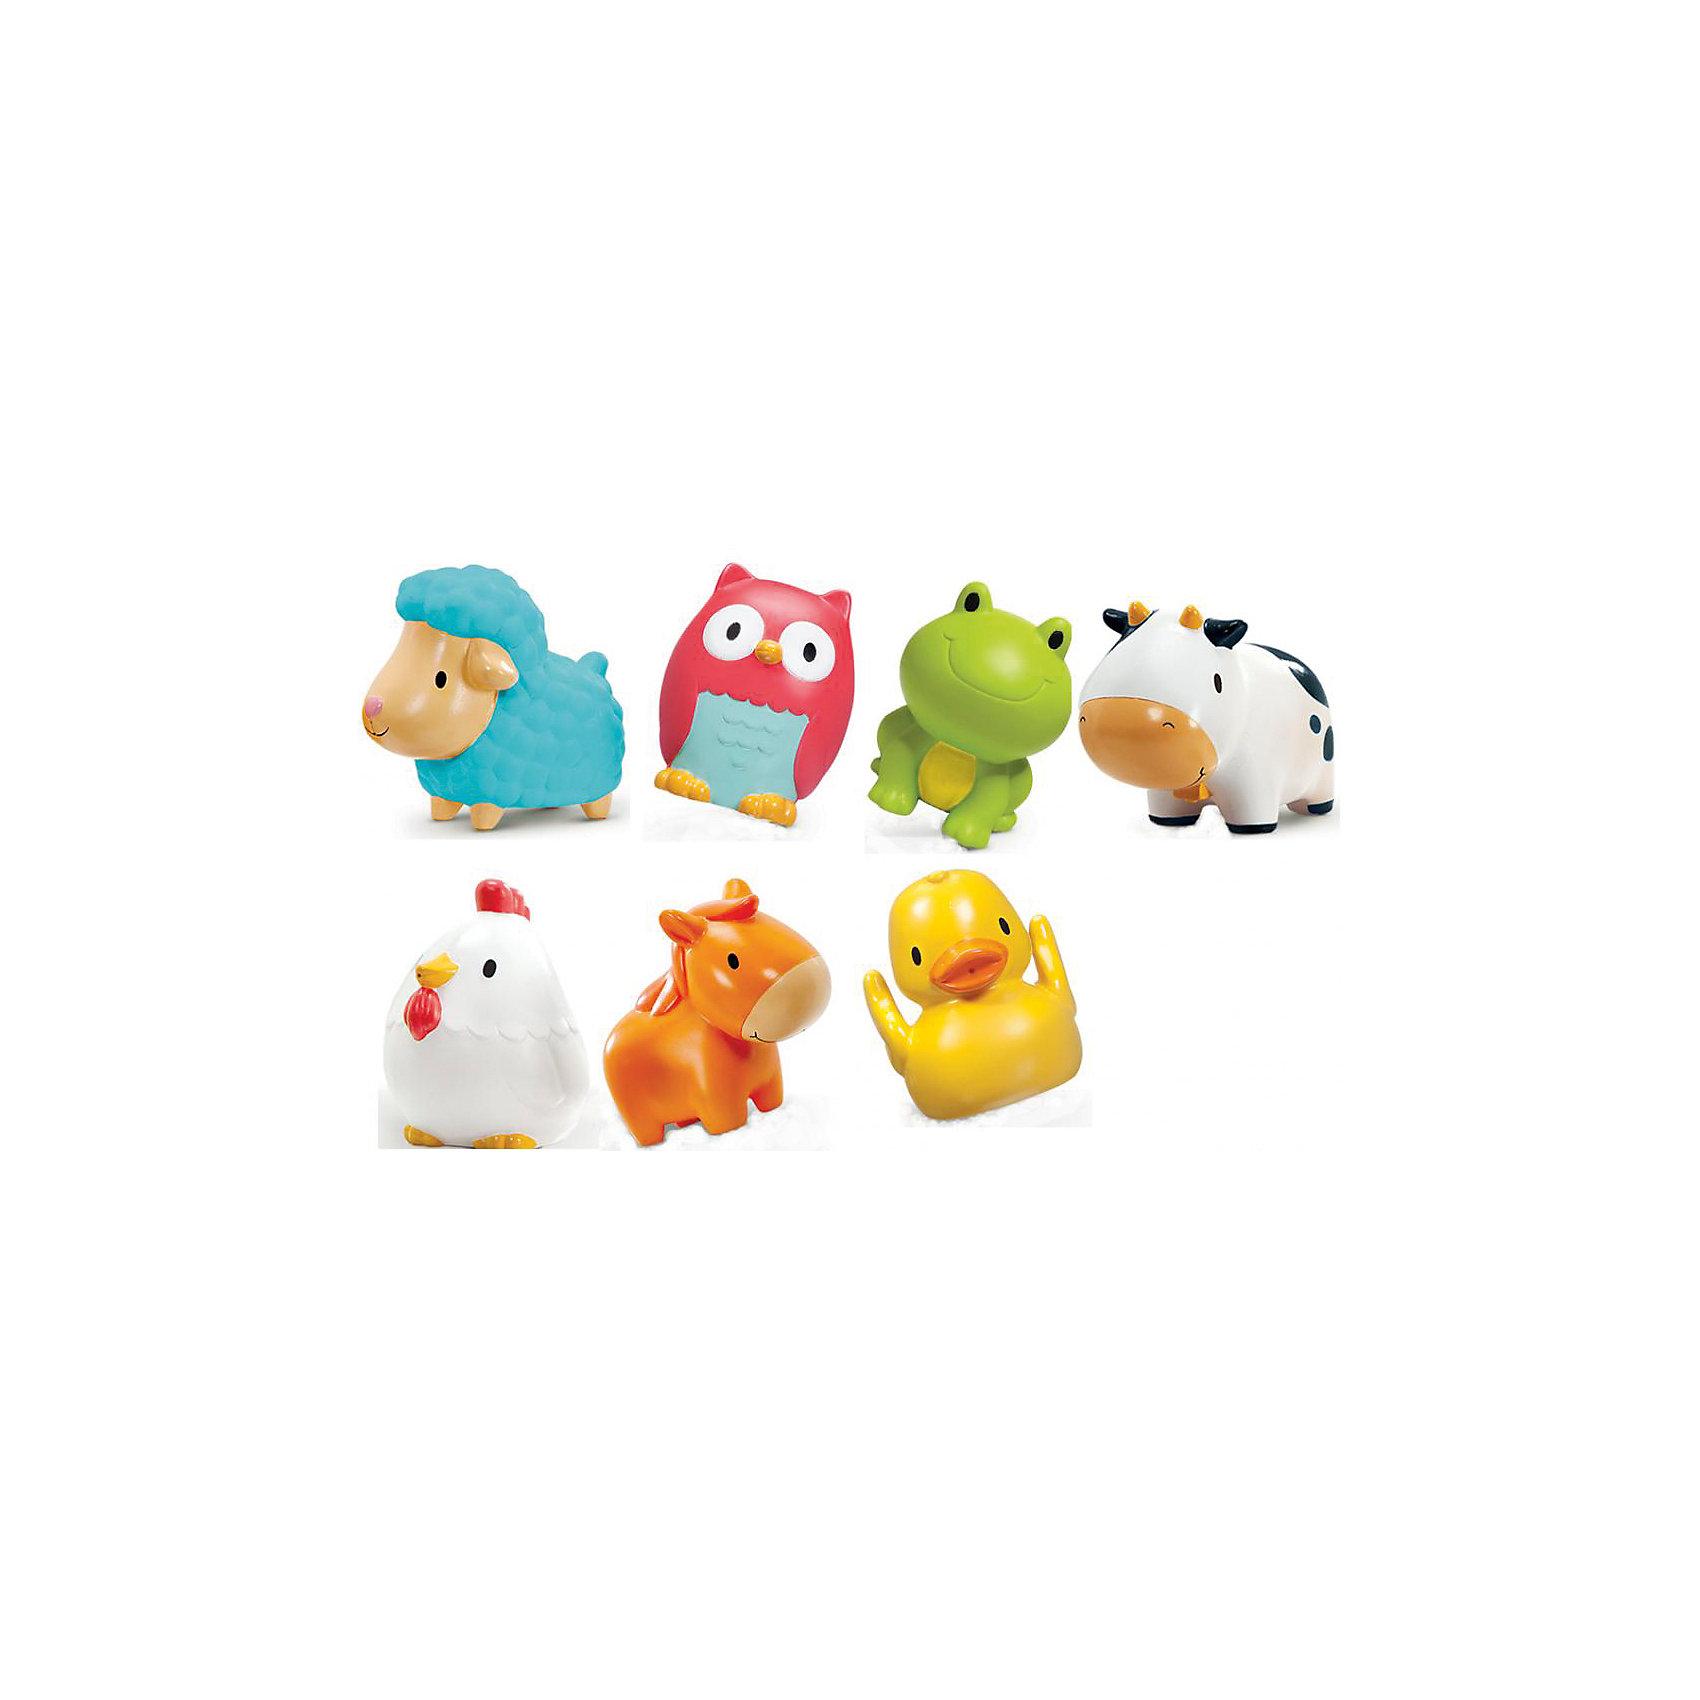 munchkin Игрушка для ванны Деревенские ферма9+, Munchkin игрушки для ванны munchkin игрушка для ванны деревенские зверюшки